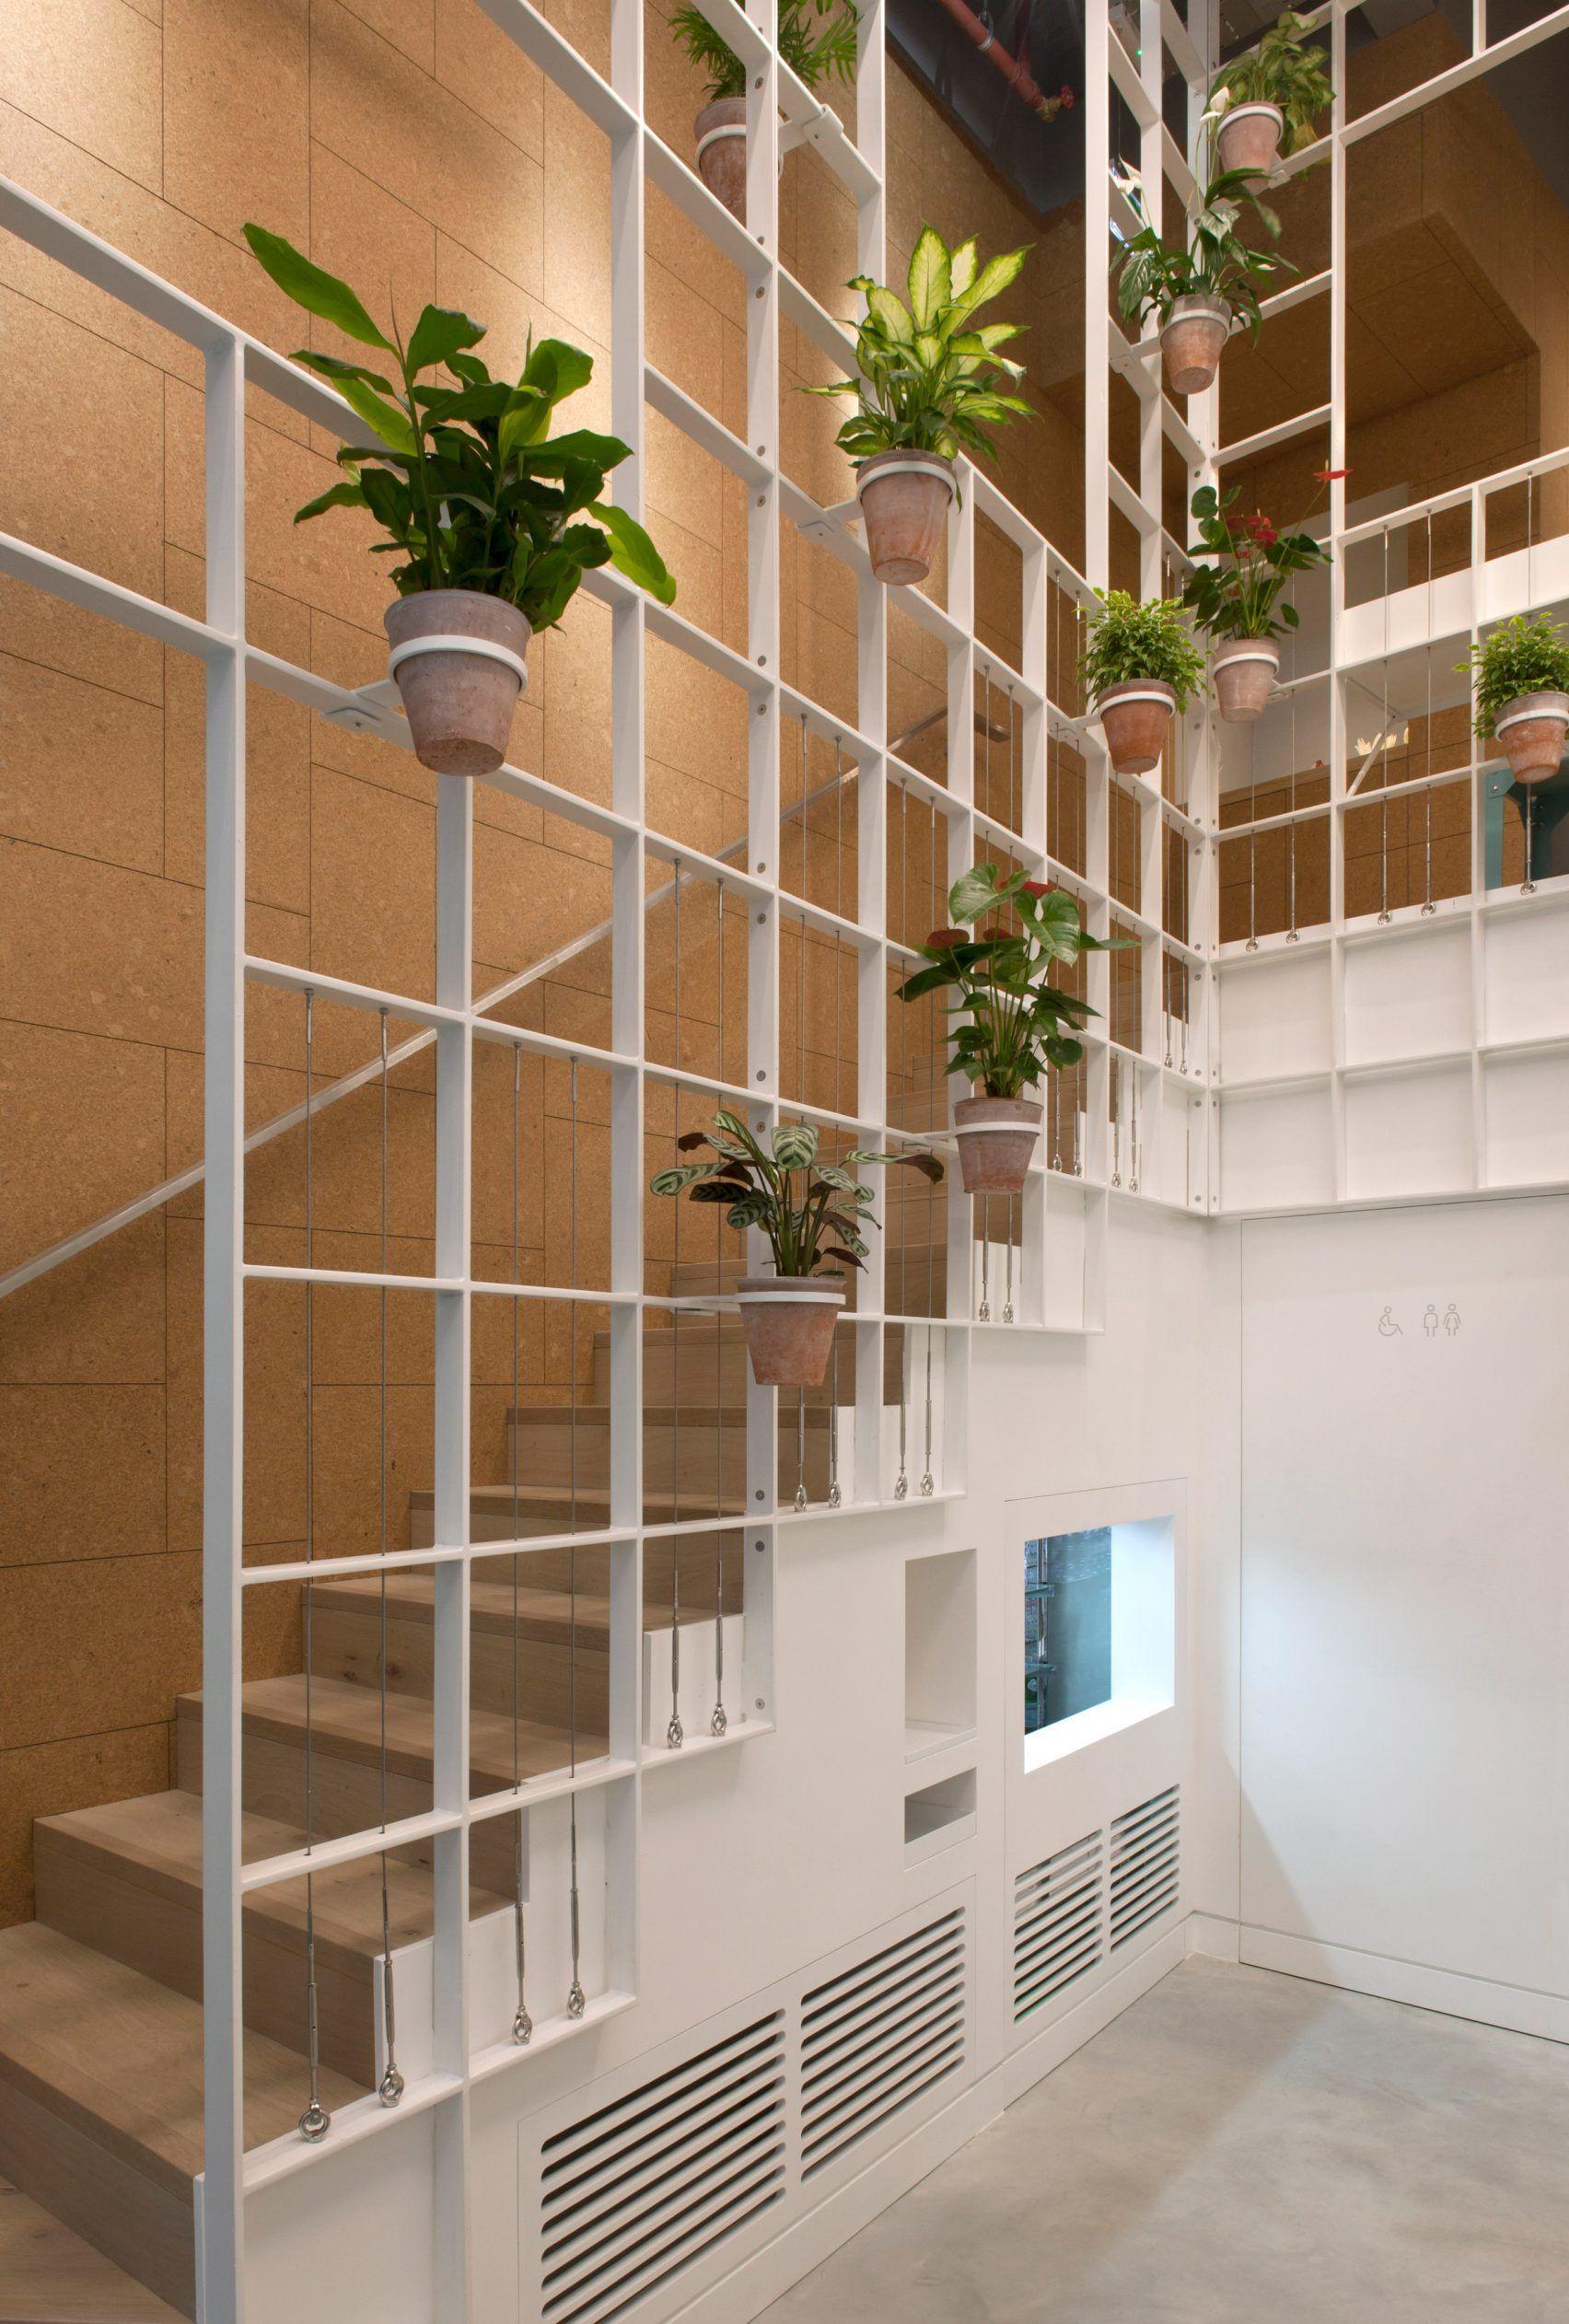 Best P*T Plants Cover Trellis Like Walls Inside London Cafe By 400 x 300